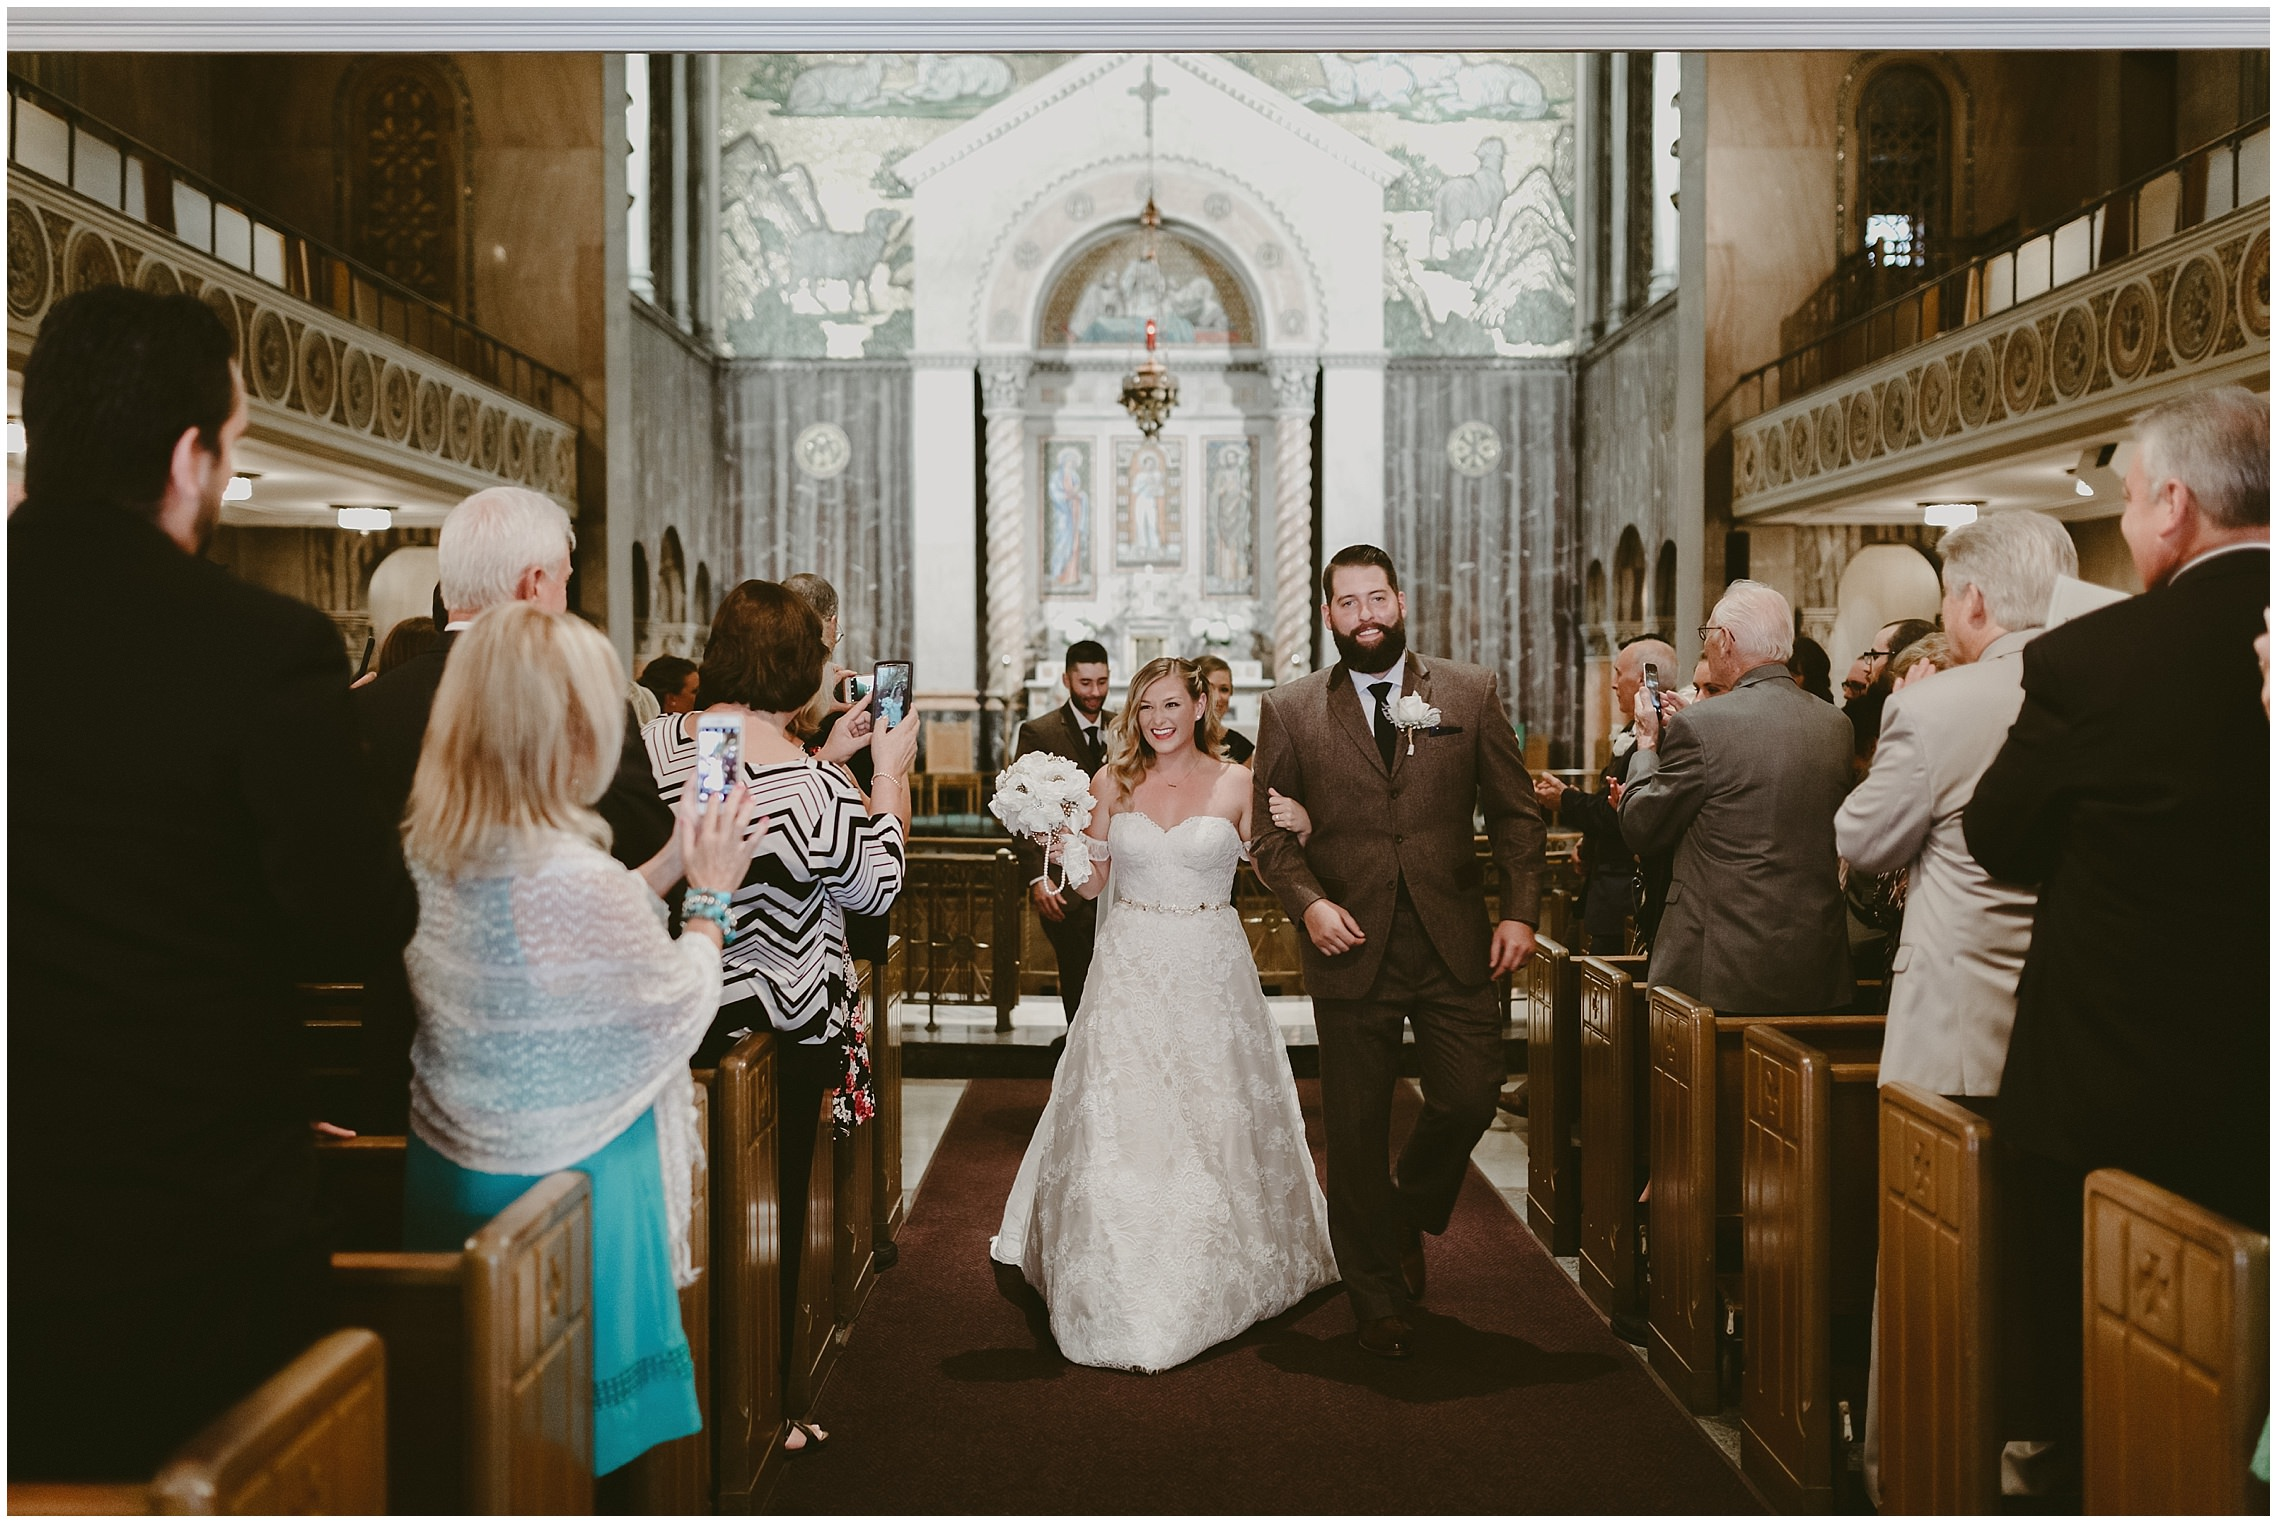 brick_and_mortar_colorado_wedding_photographer_0228.jpg